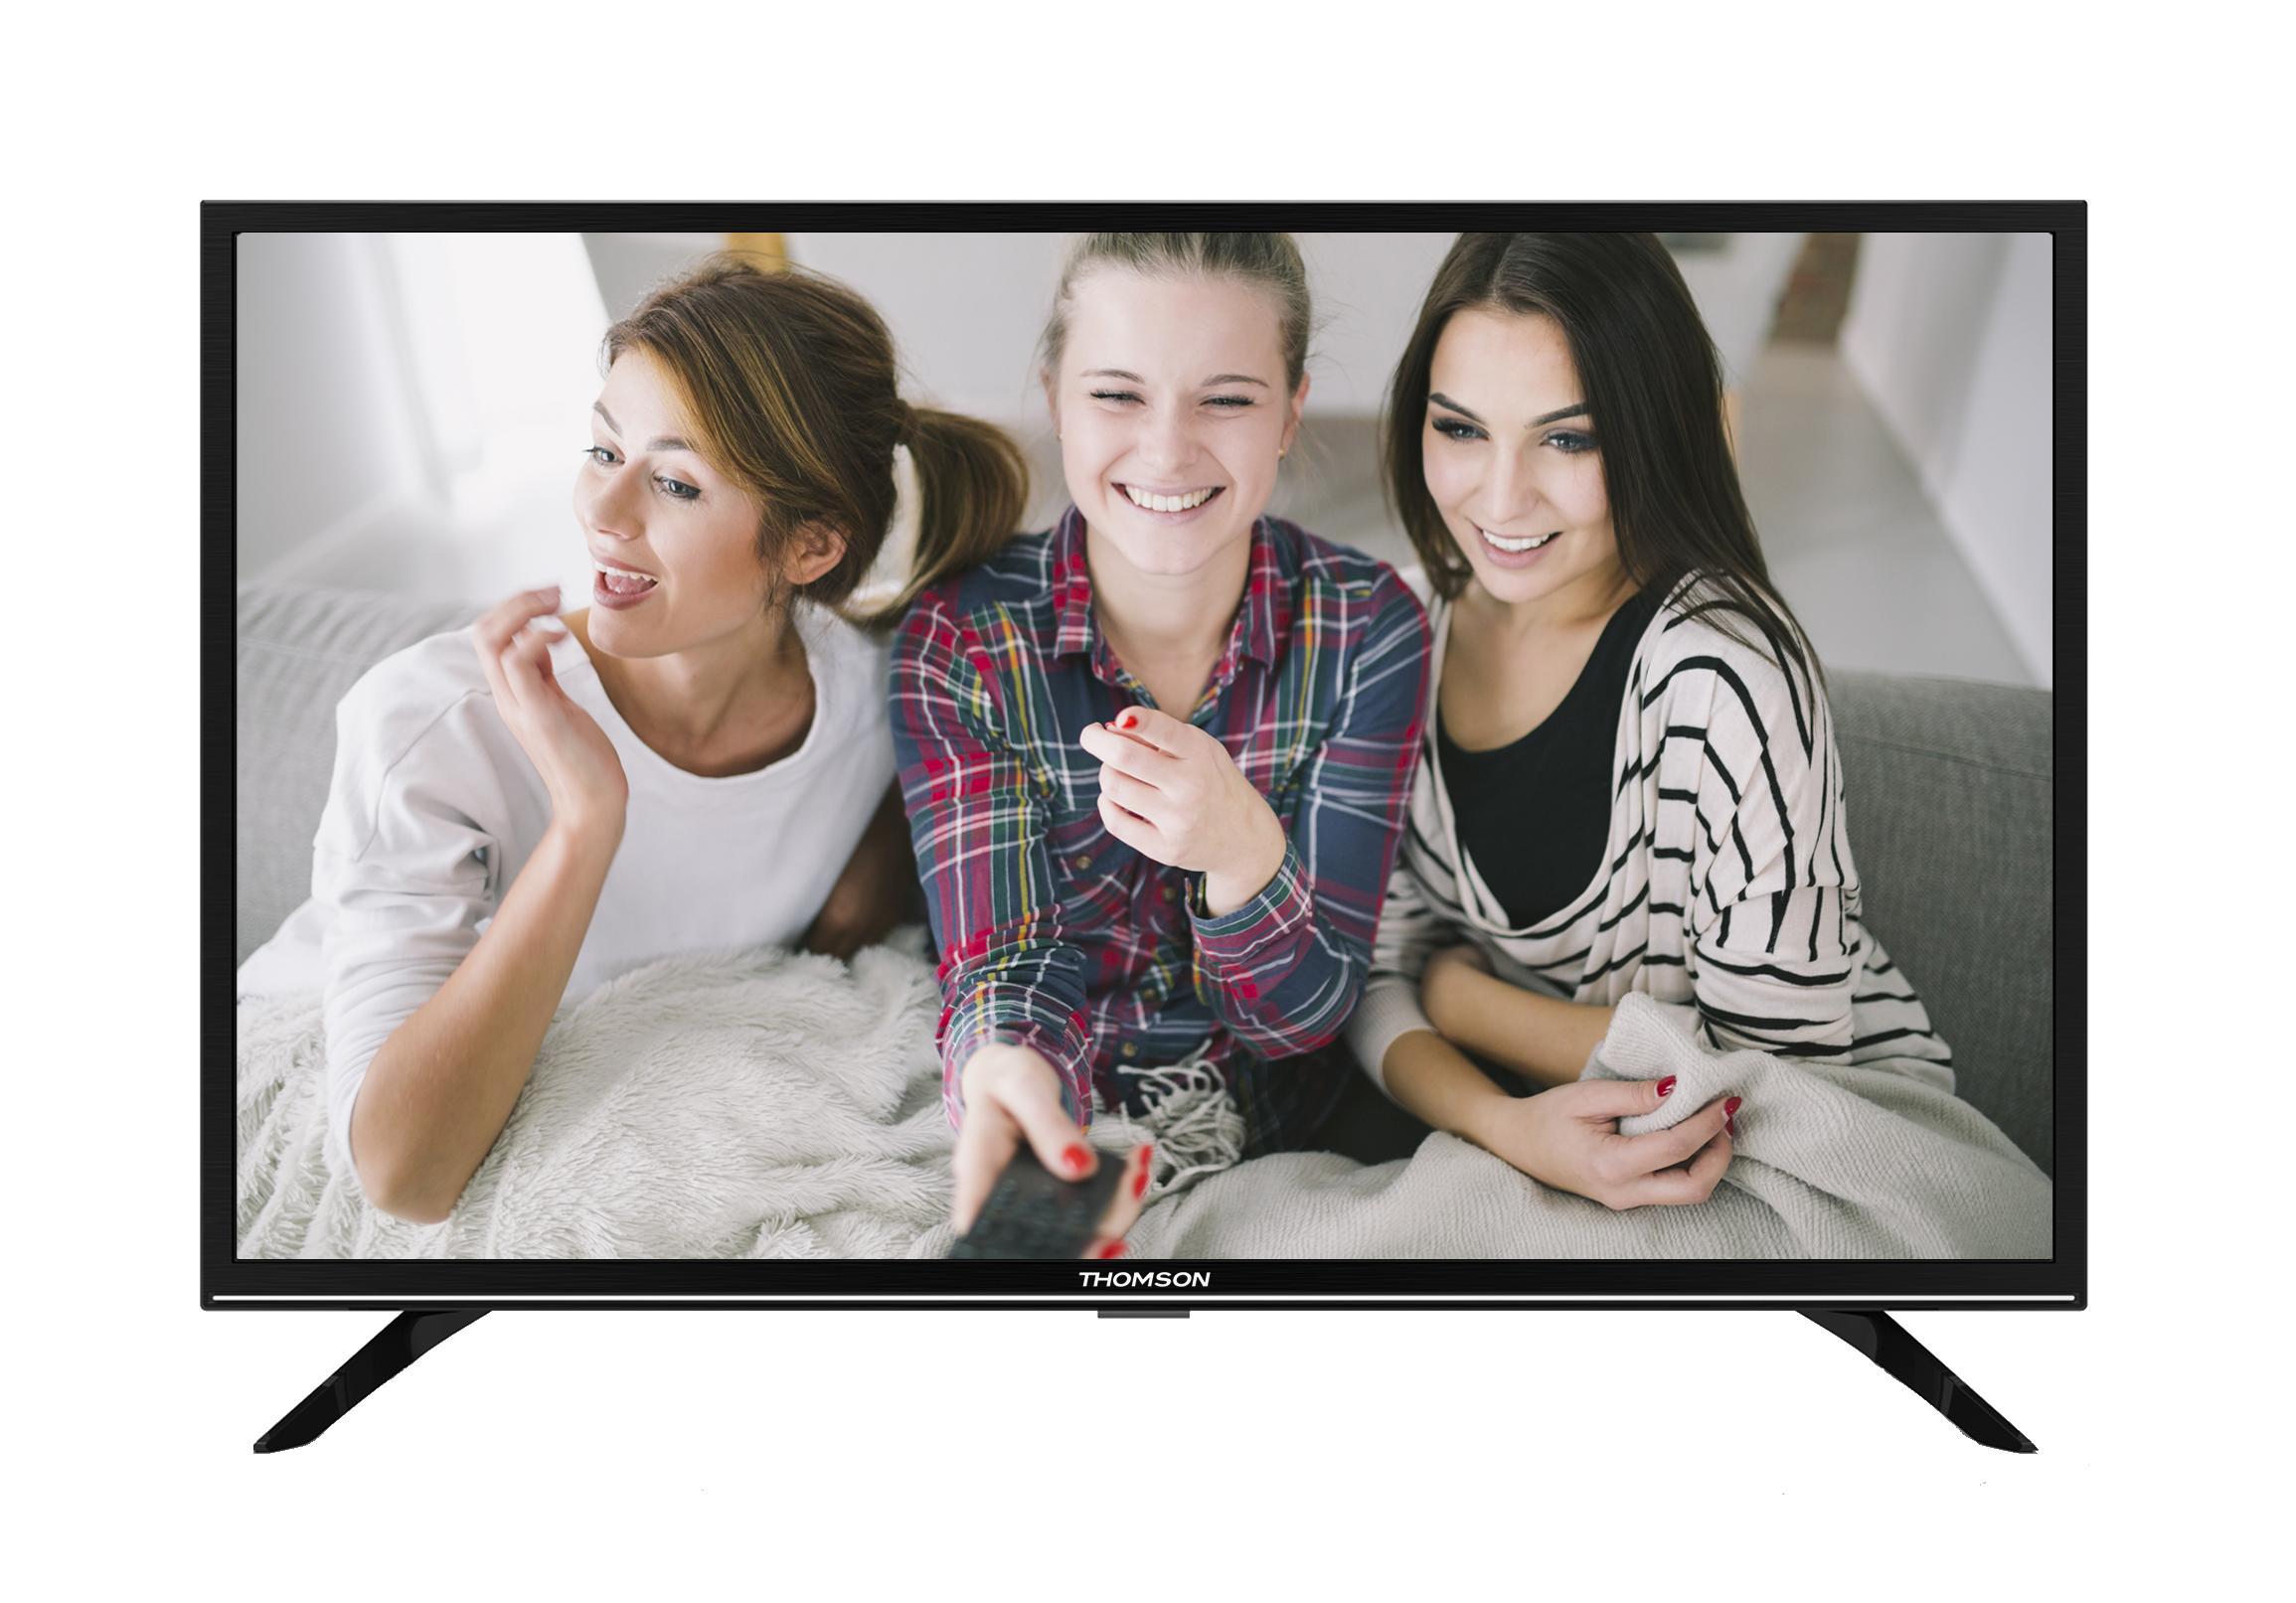 Телевизор LED 32 Thomson T32RTE1160 Черный, HD Ready, DVB-T2, HDMI, USB жк телевизор thomson t19e21dh 01b